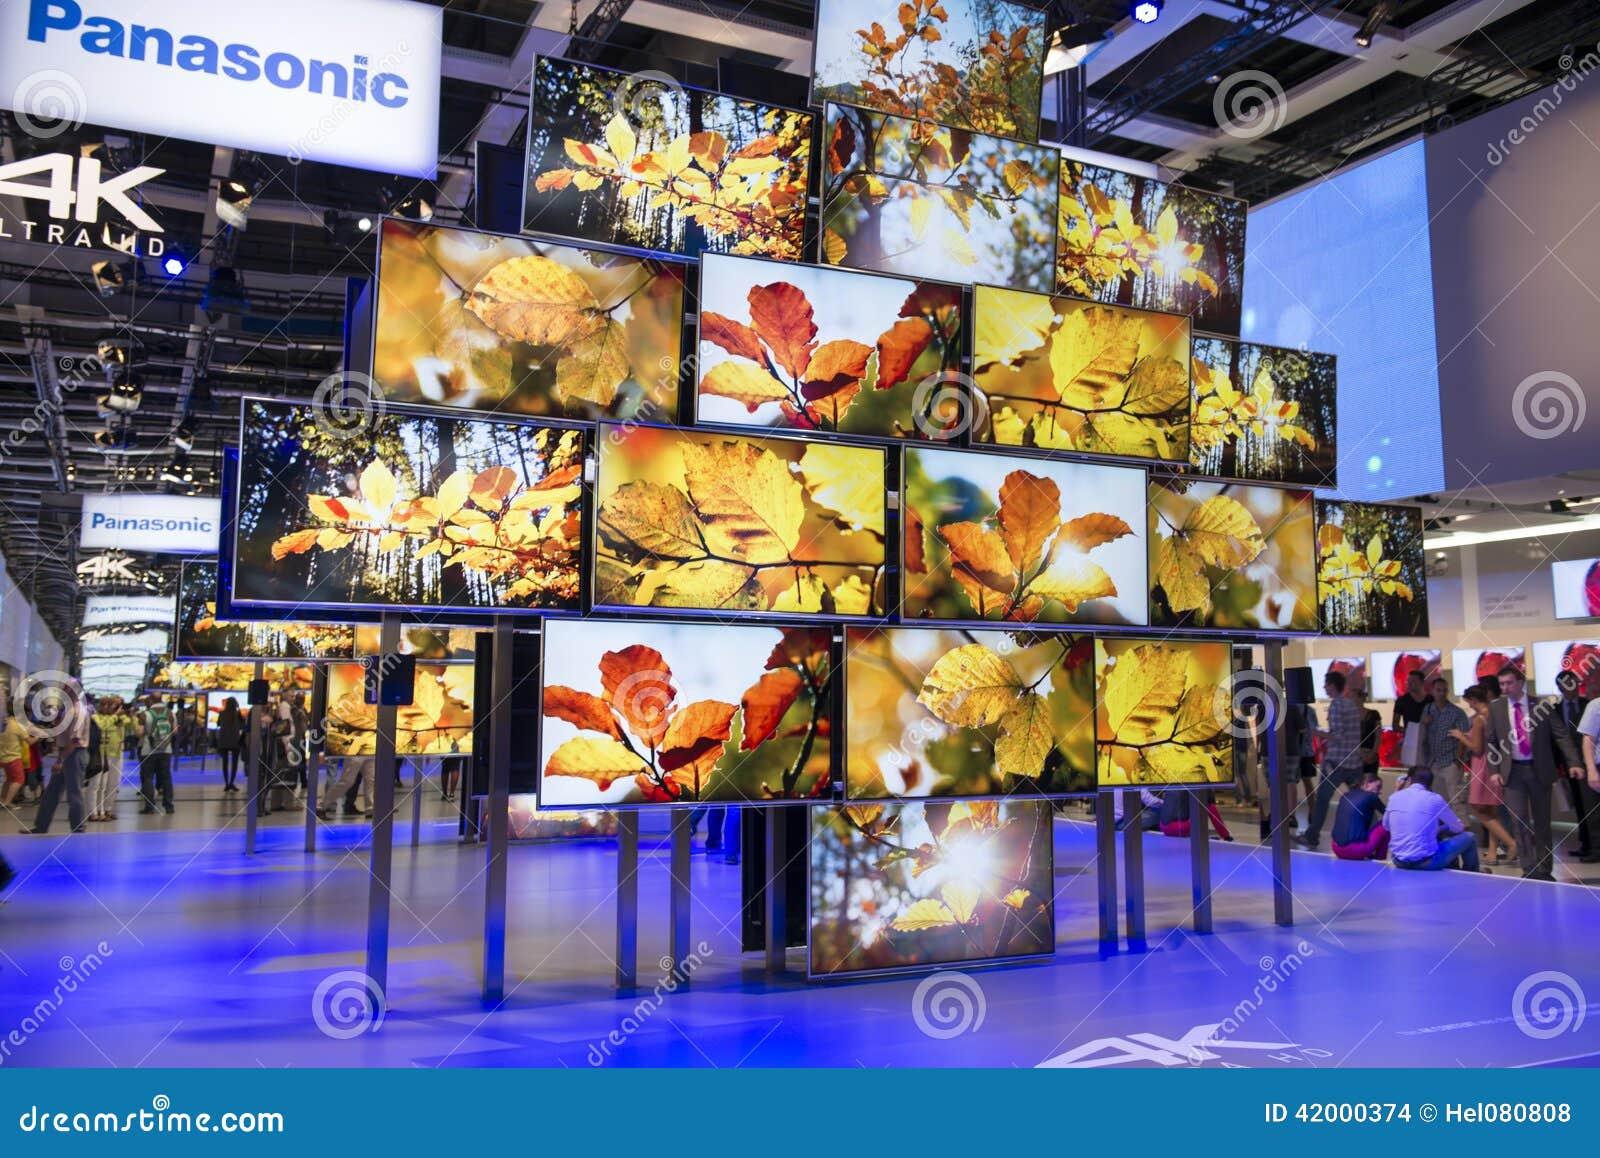 Panasonic 4 K ultra HD TV